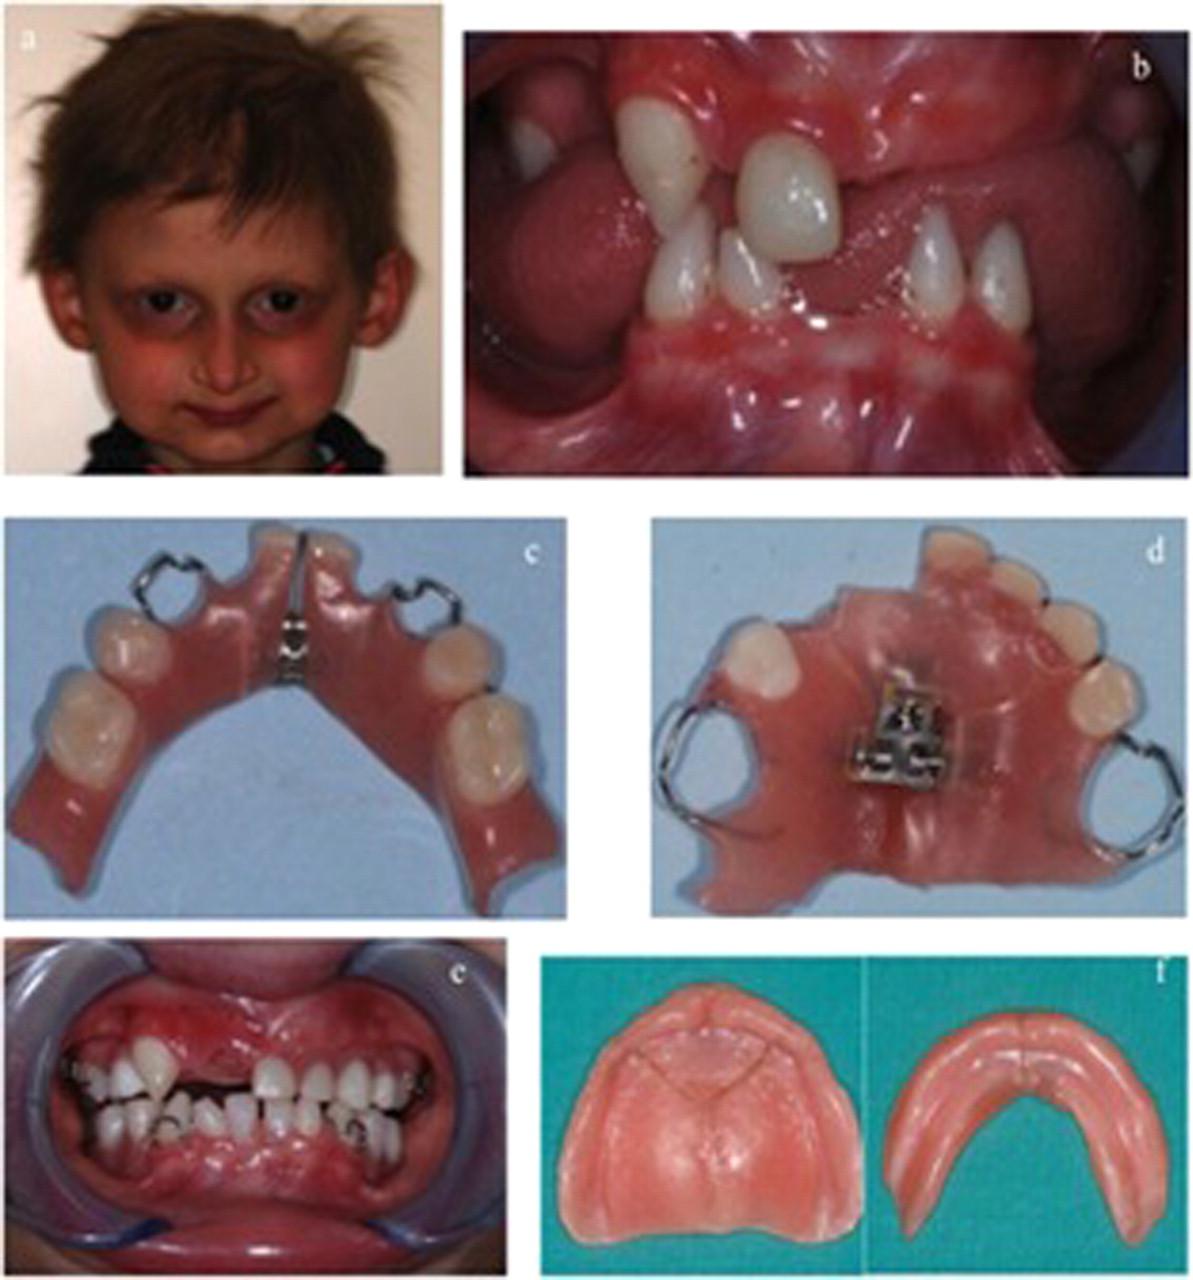 Oral rehabilitation of children with ectodermal dysplasia